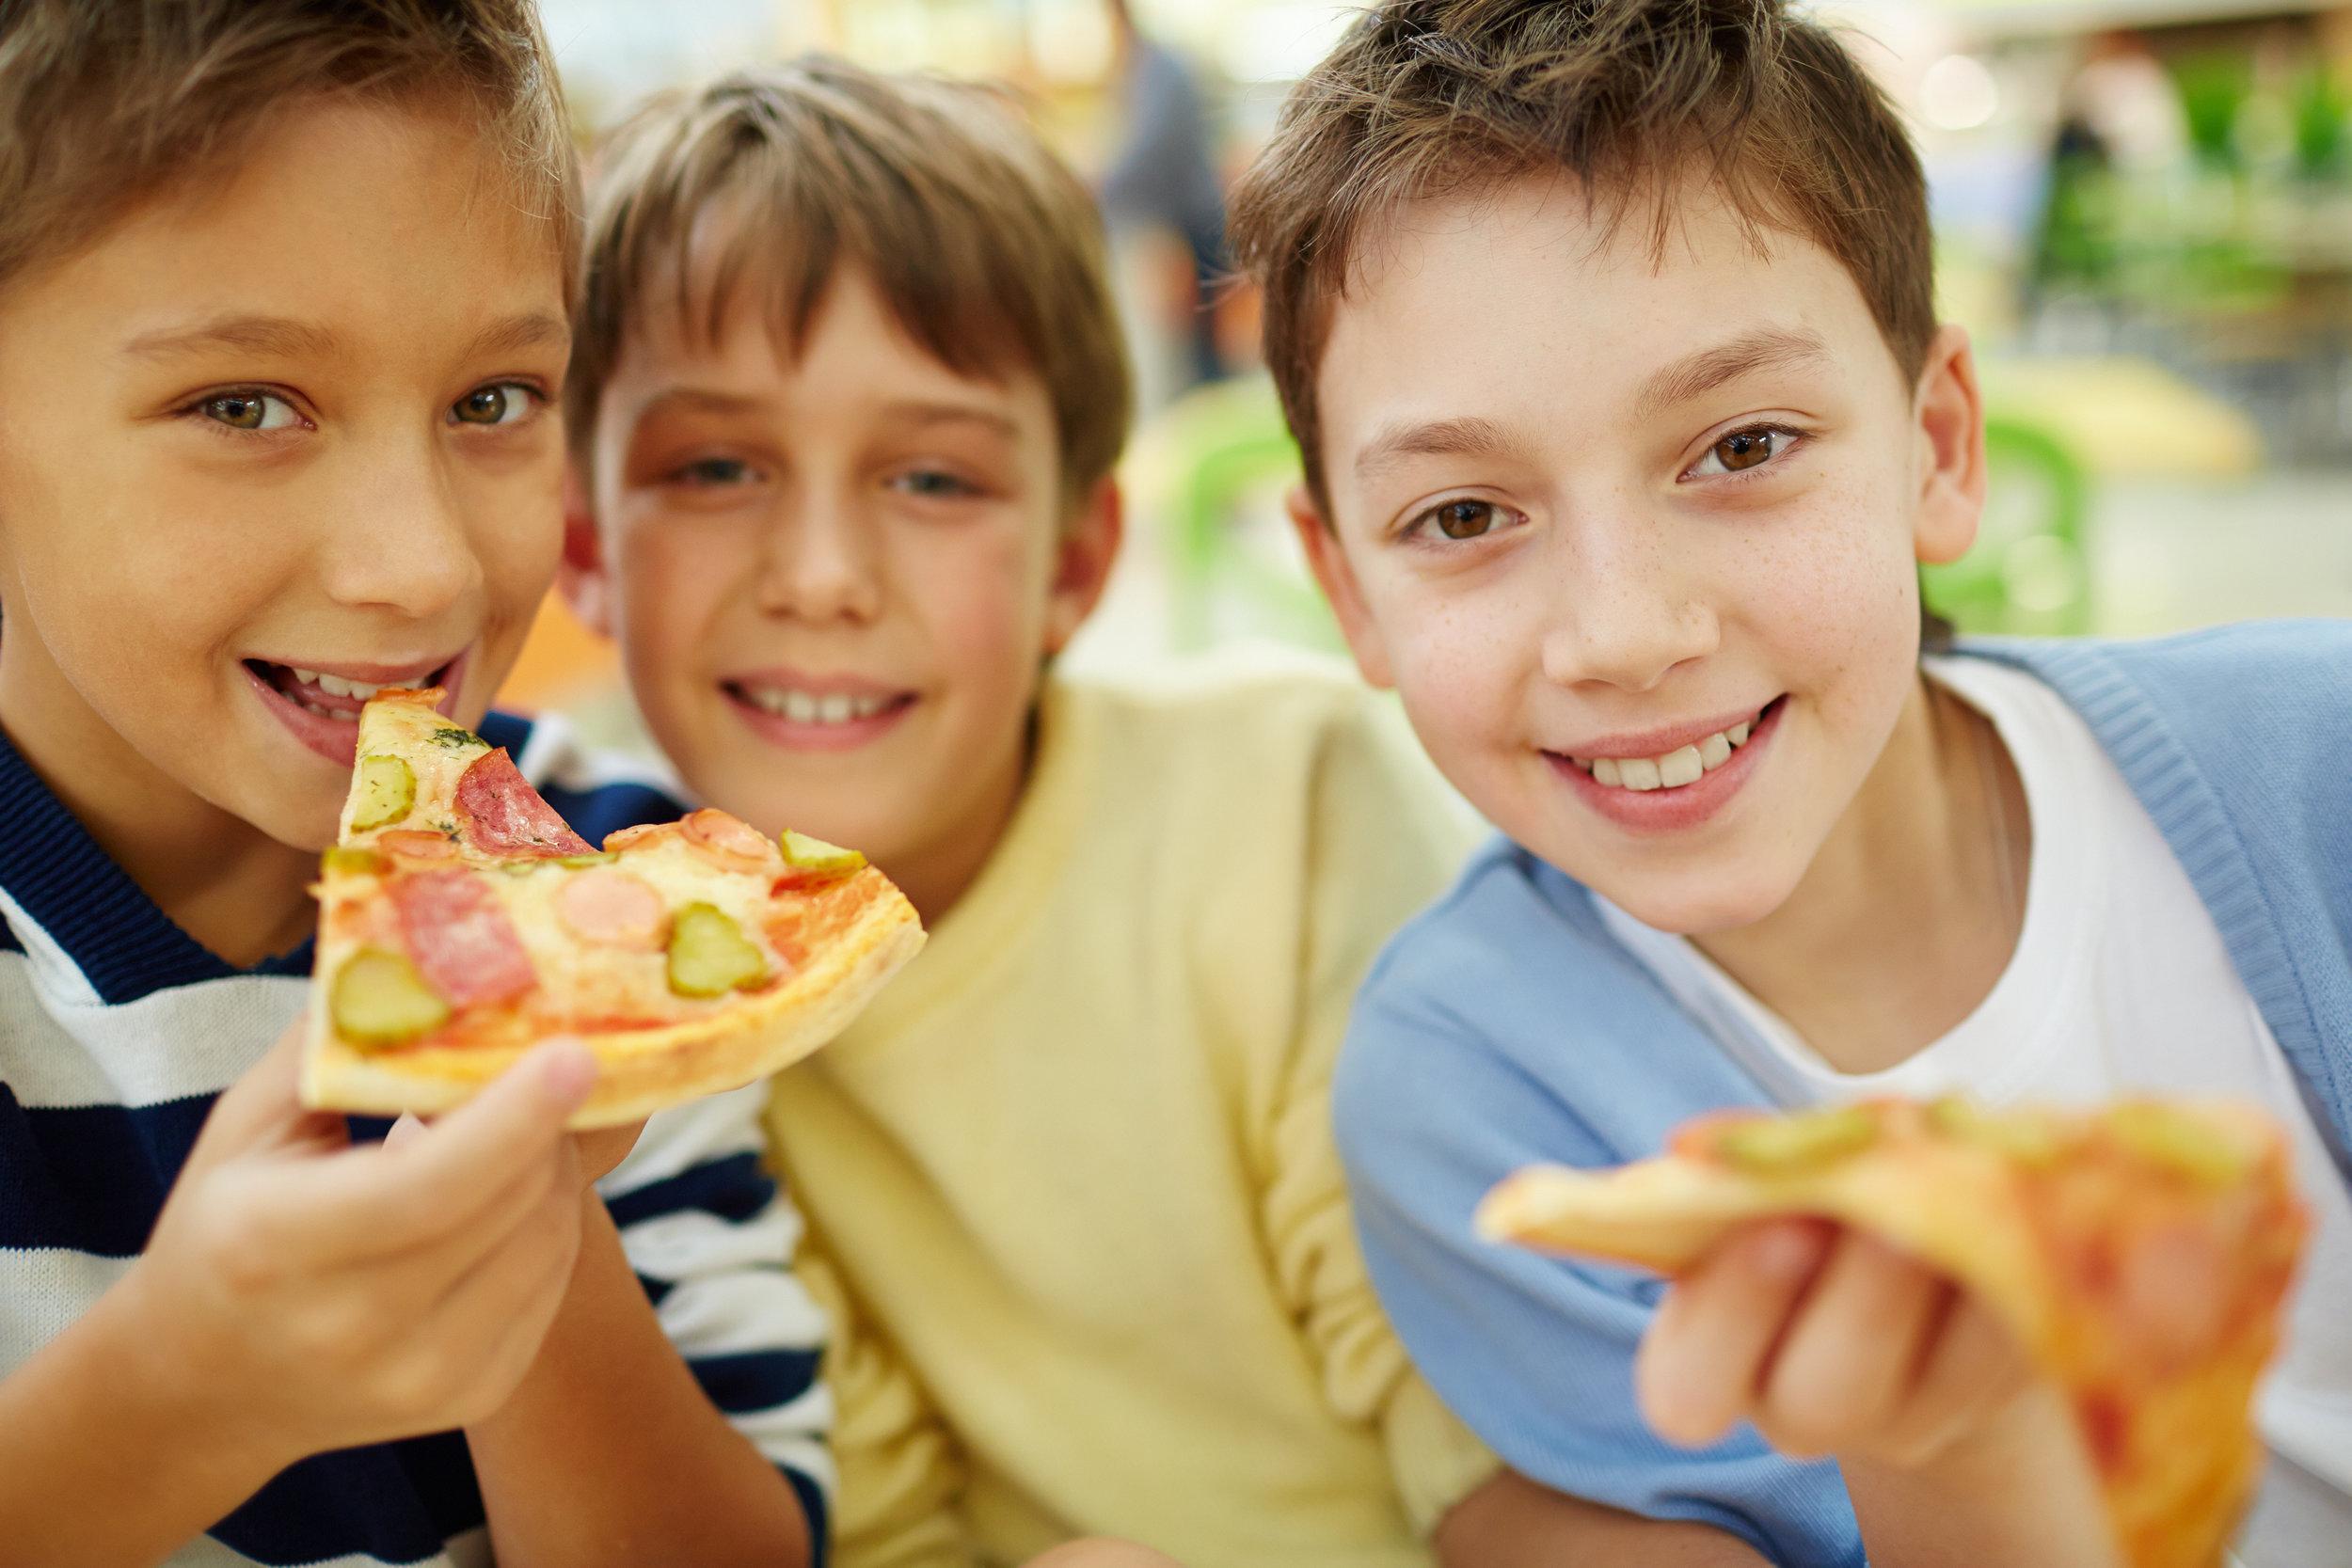 pizza kidsAdobeStock_61563848.jpeg